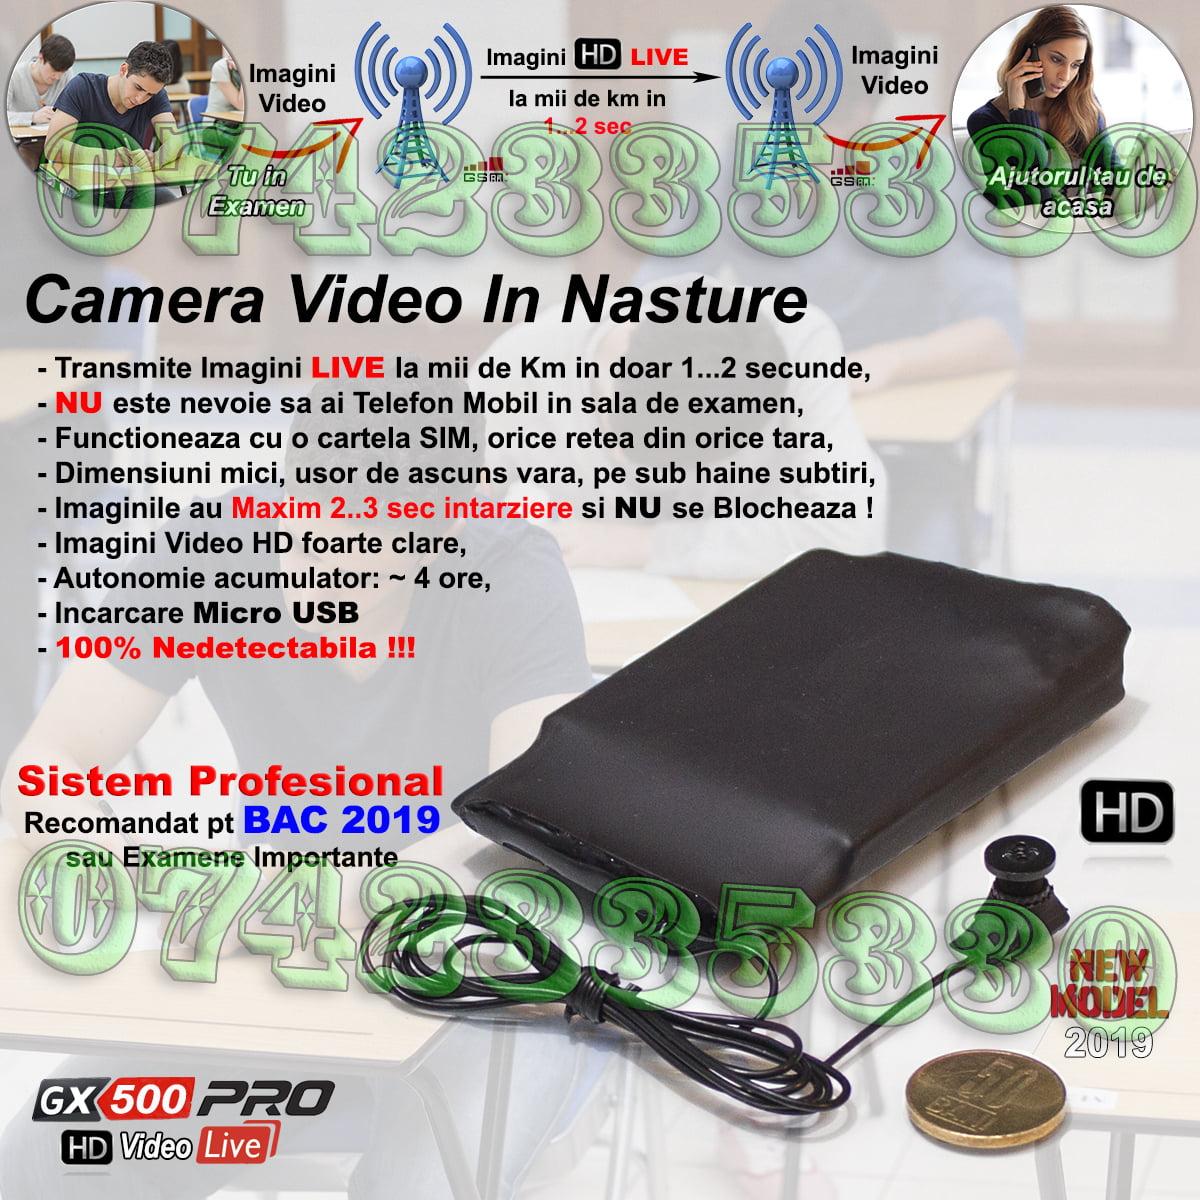 casca de copiat cu camera video